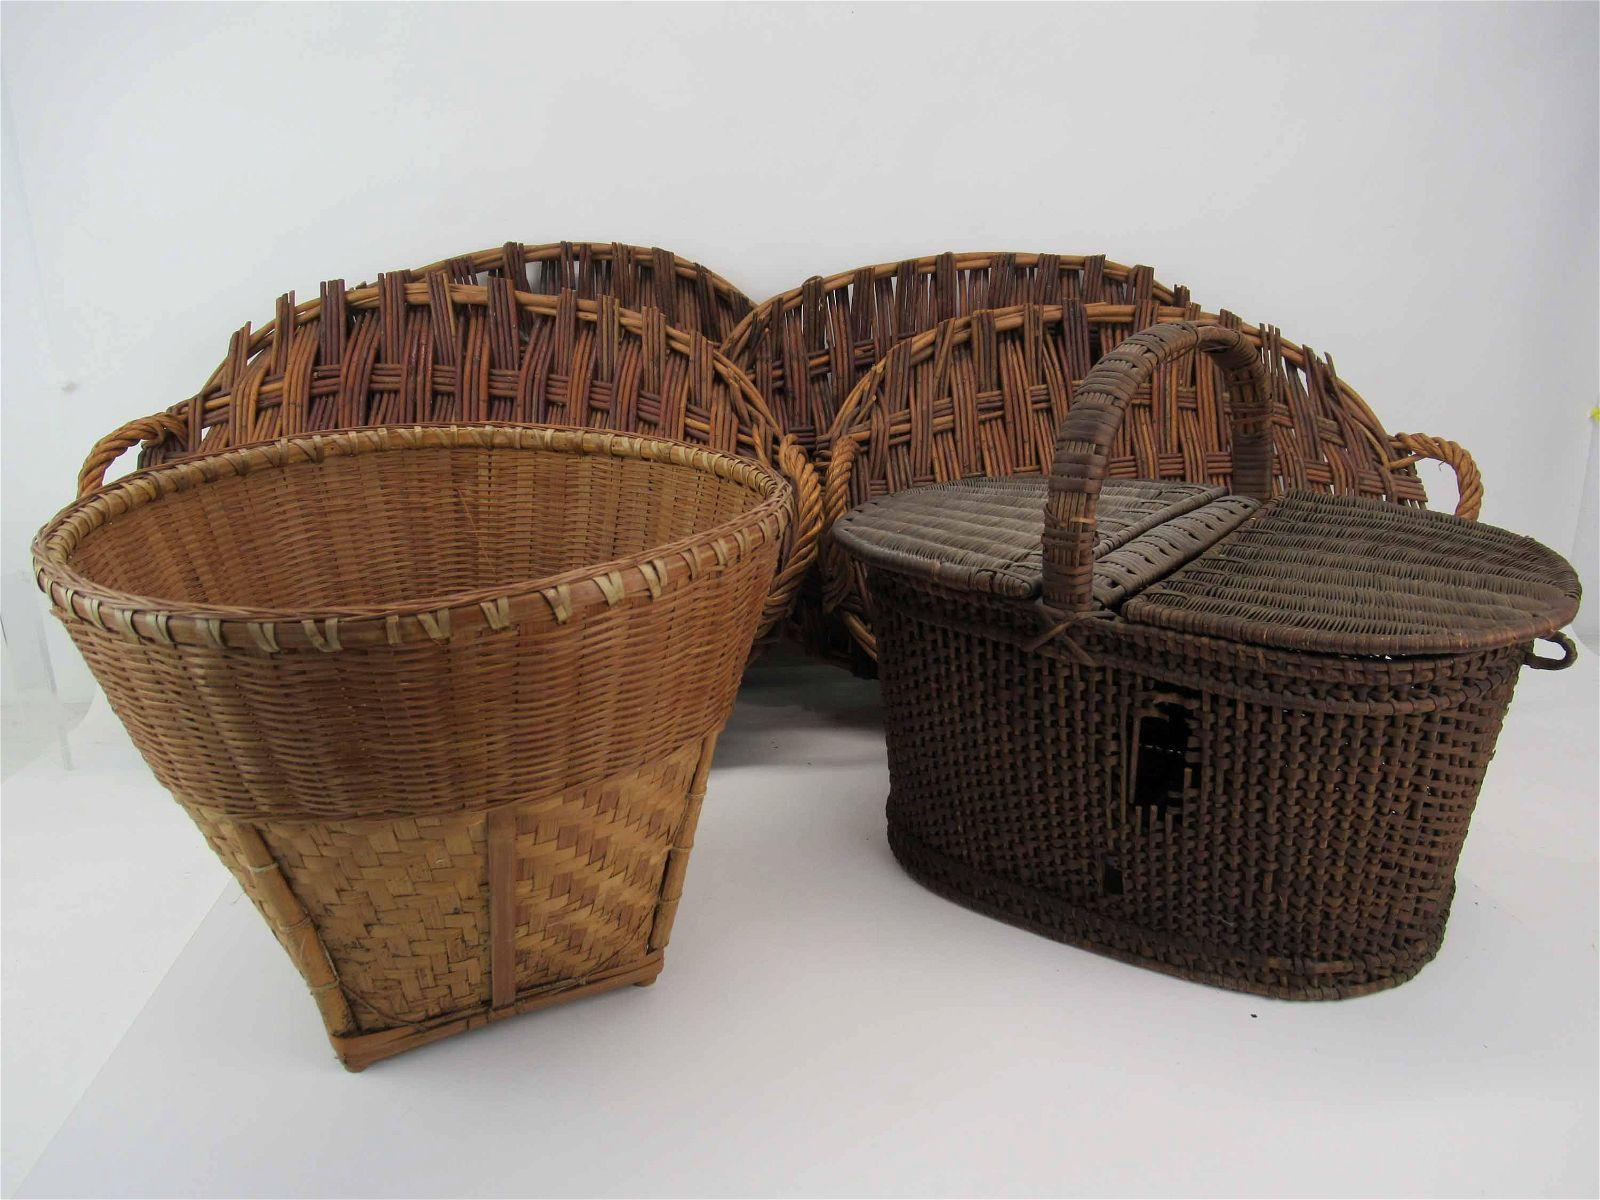 Antique Shaker Woven Basket